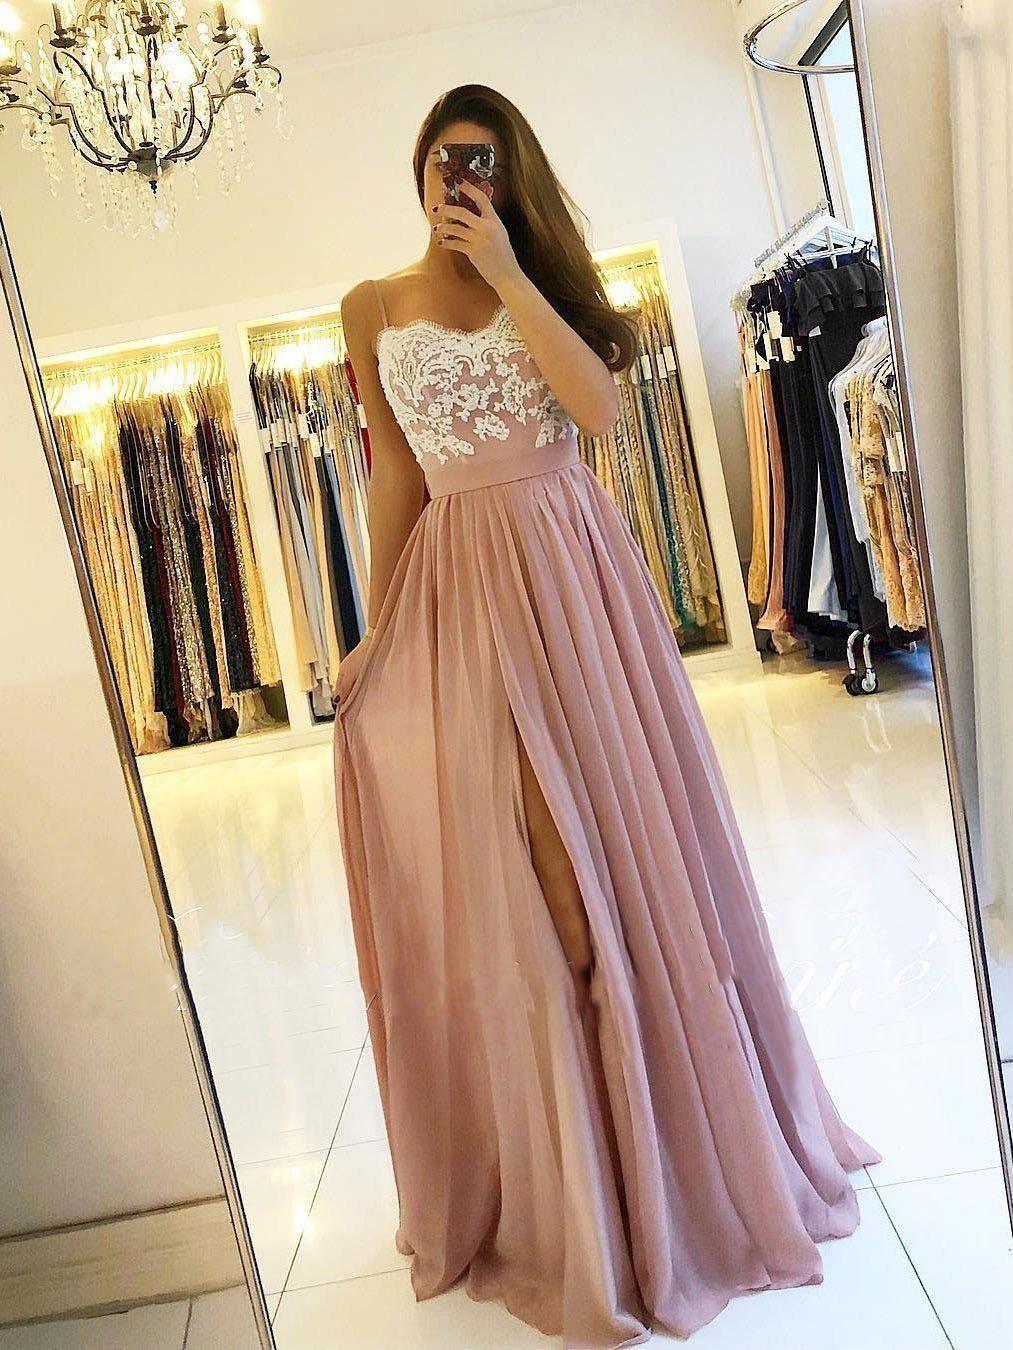 9283ea49e3a28 Spaghetti Strap Dusty Rose Prom Dresses with Slit Cheap Lace Bodice  Bridesmaid Dress APD3325 $233.99 $144.99